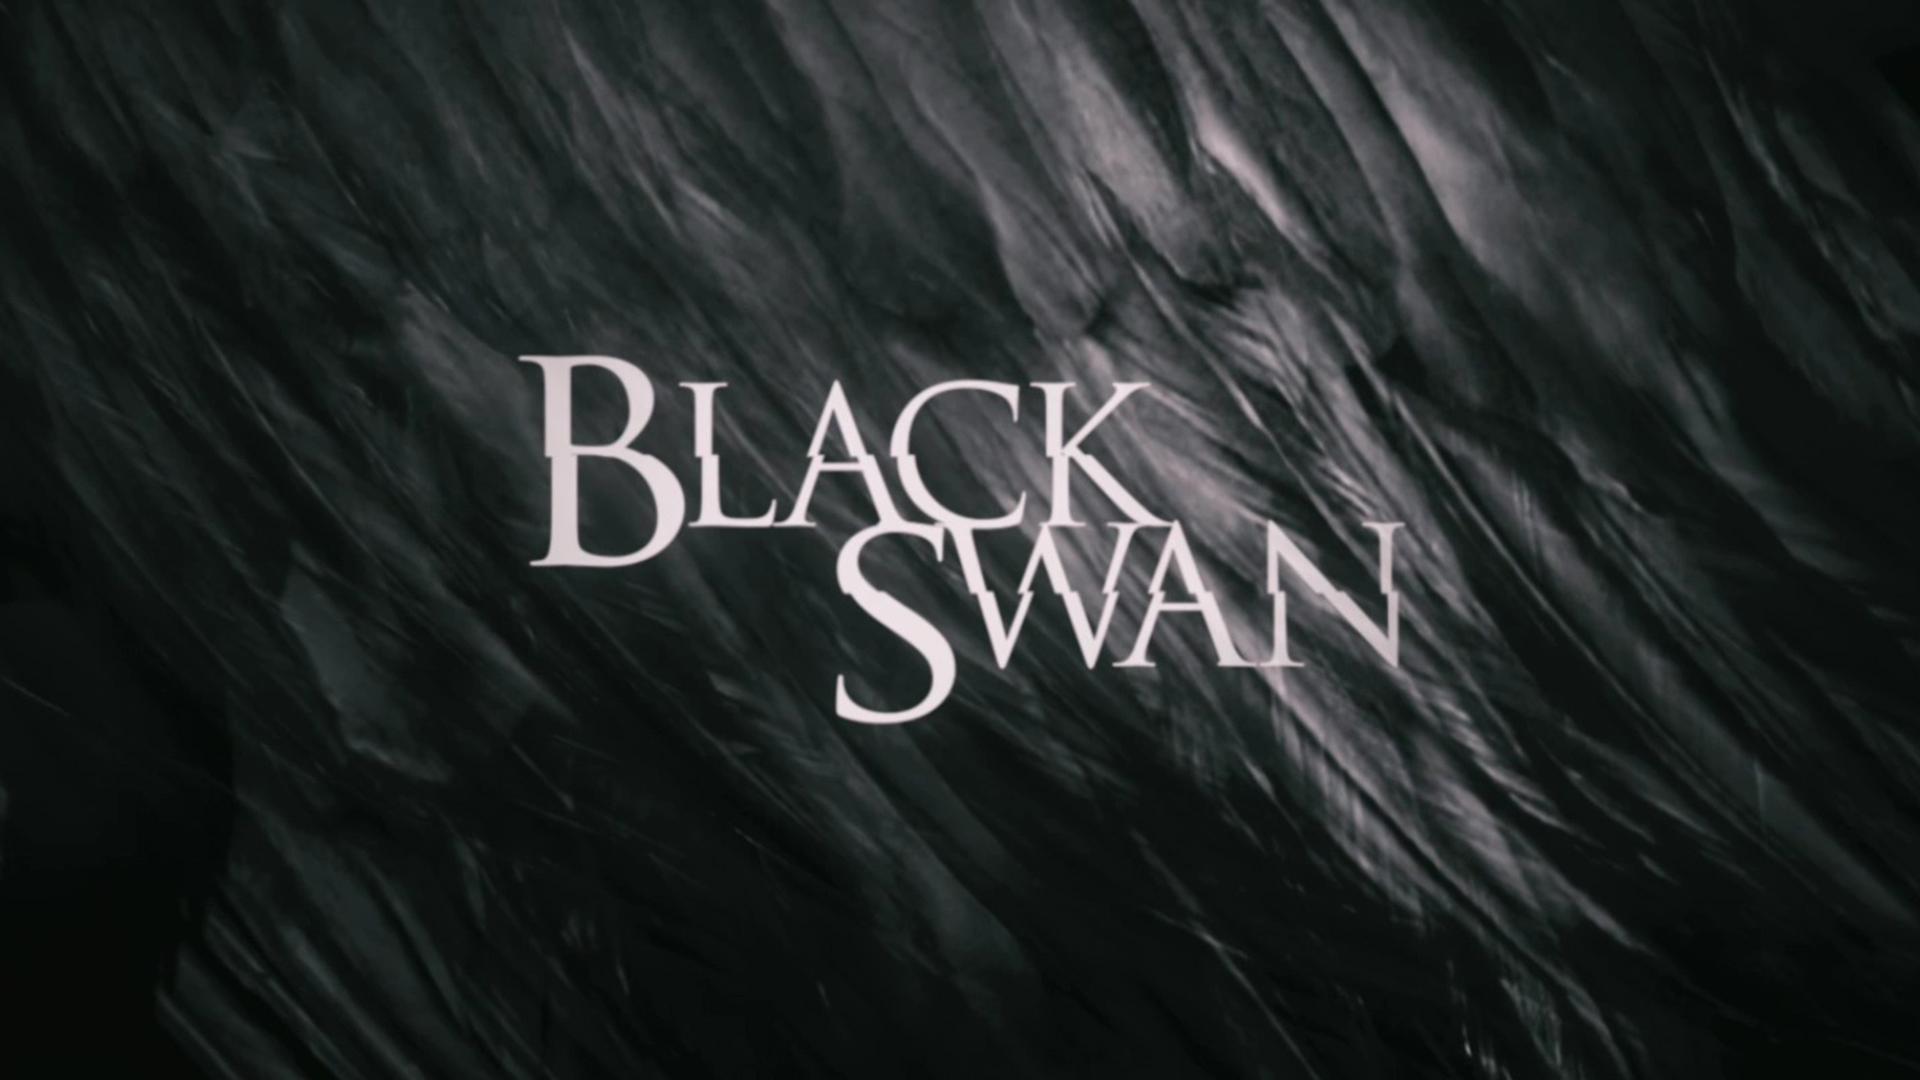 Black Swan Wallpapers 1920x1080